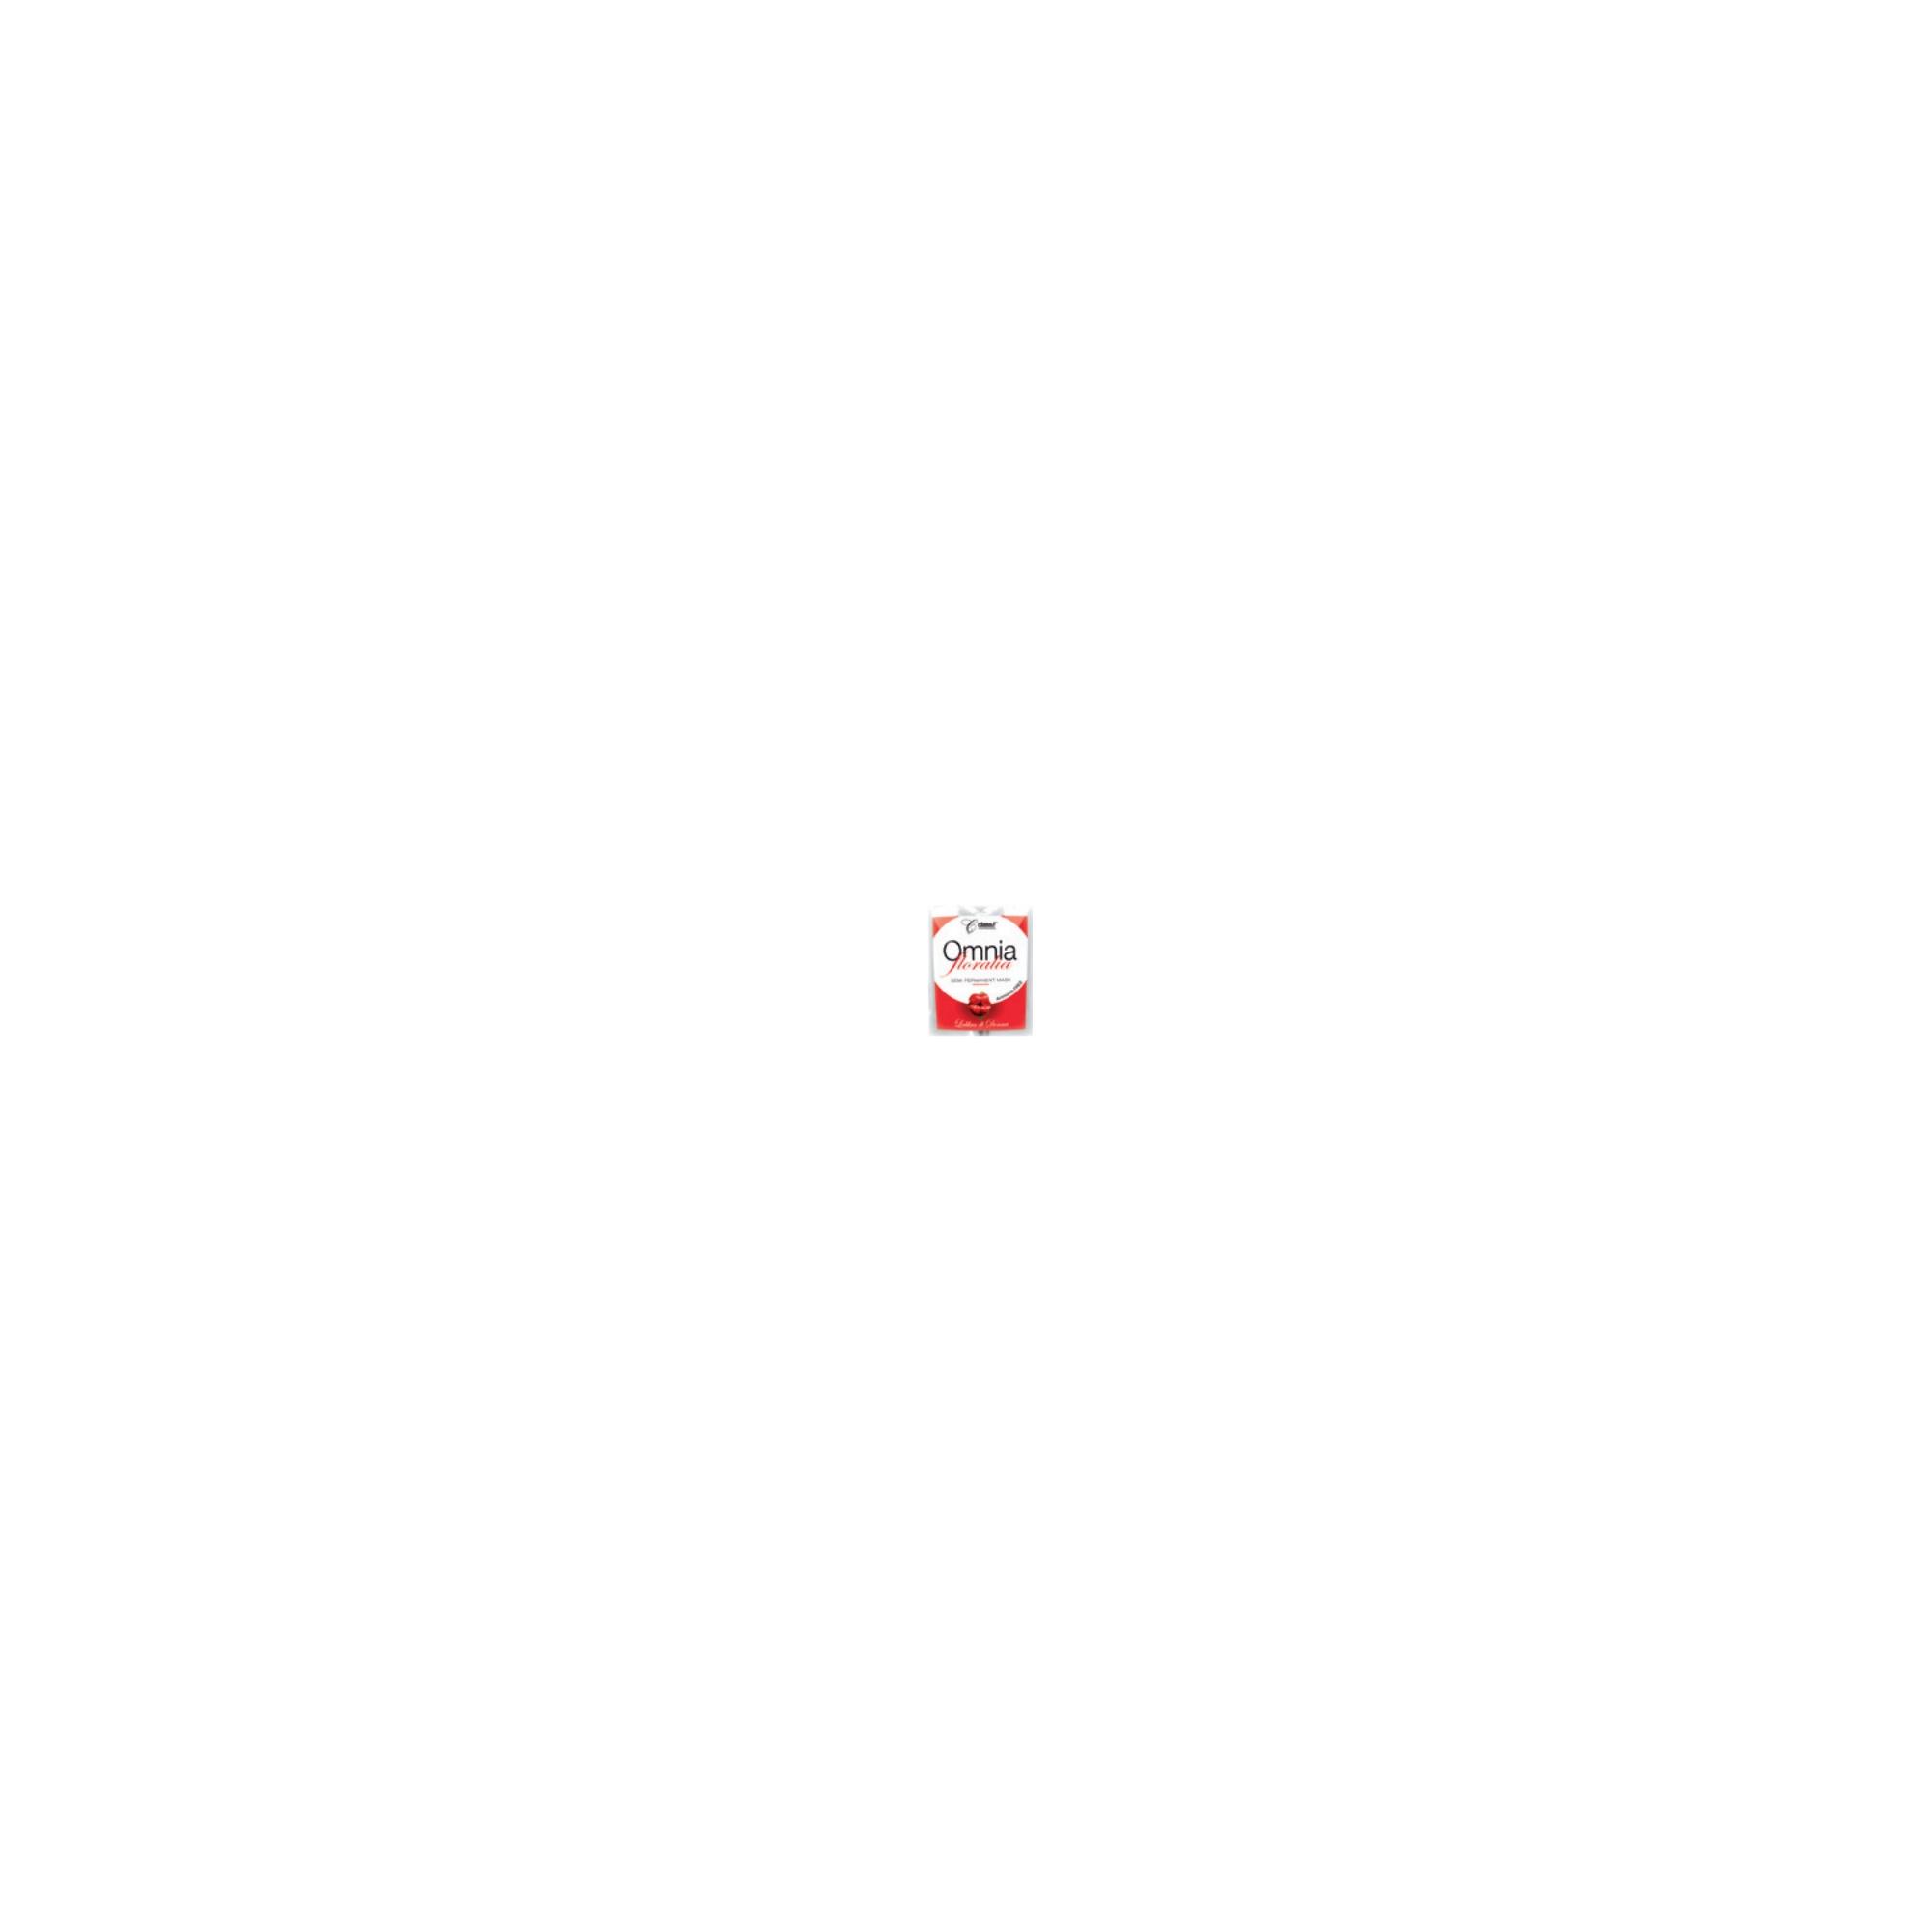 Omnia floralia - Maschera semipermanente Labbra di donna